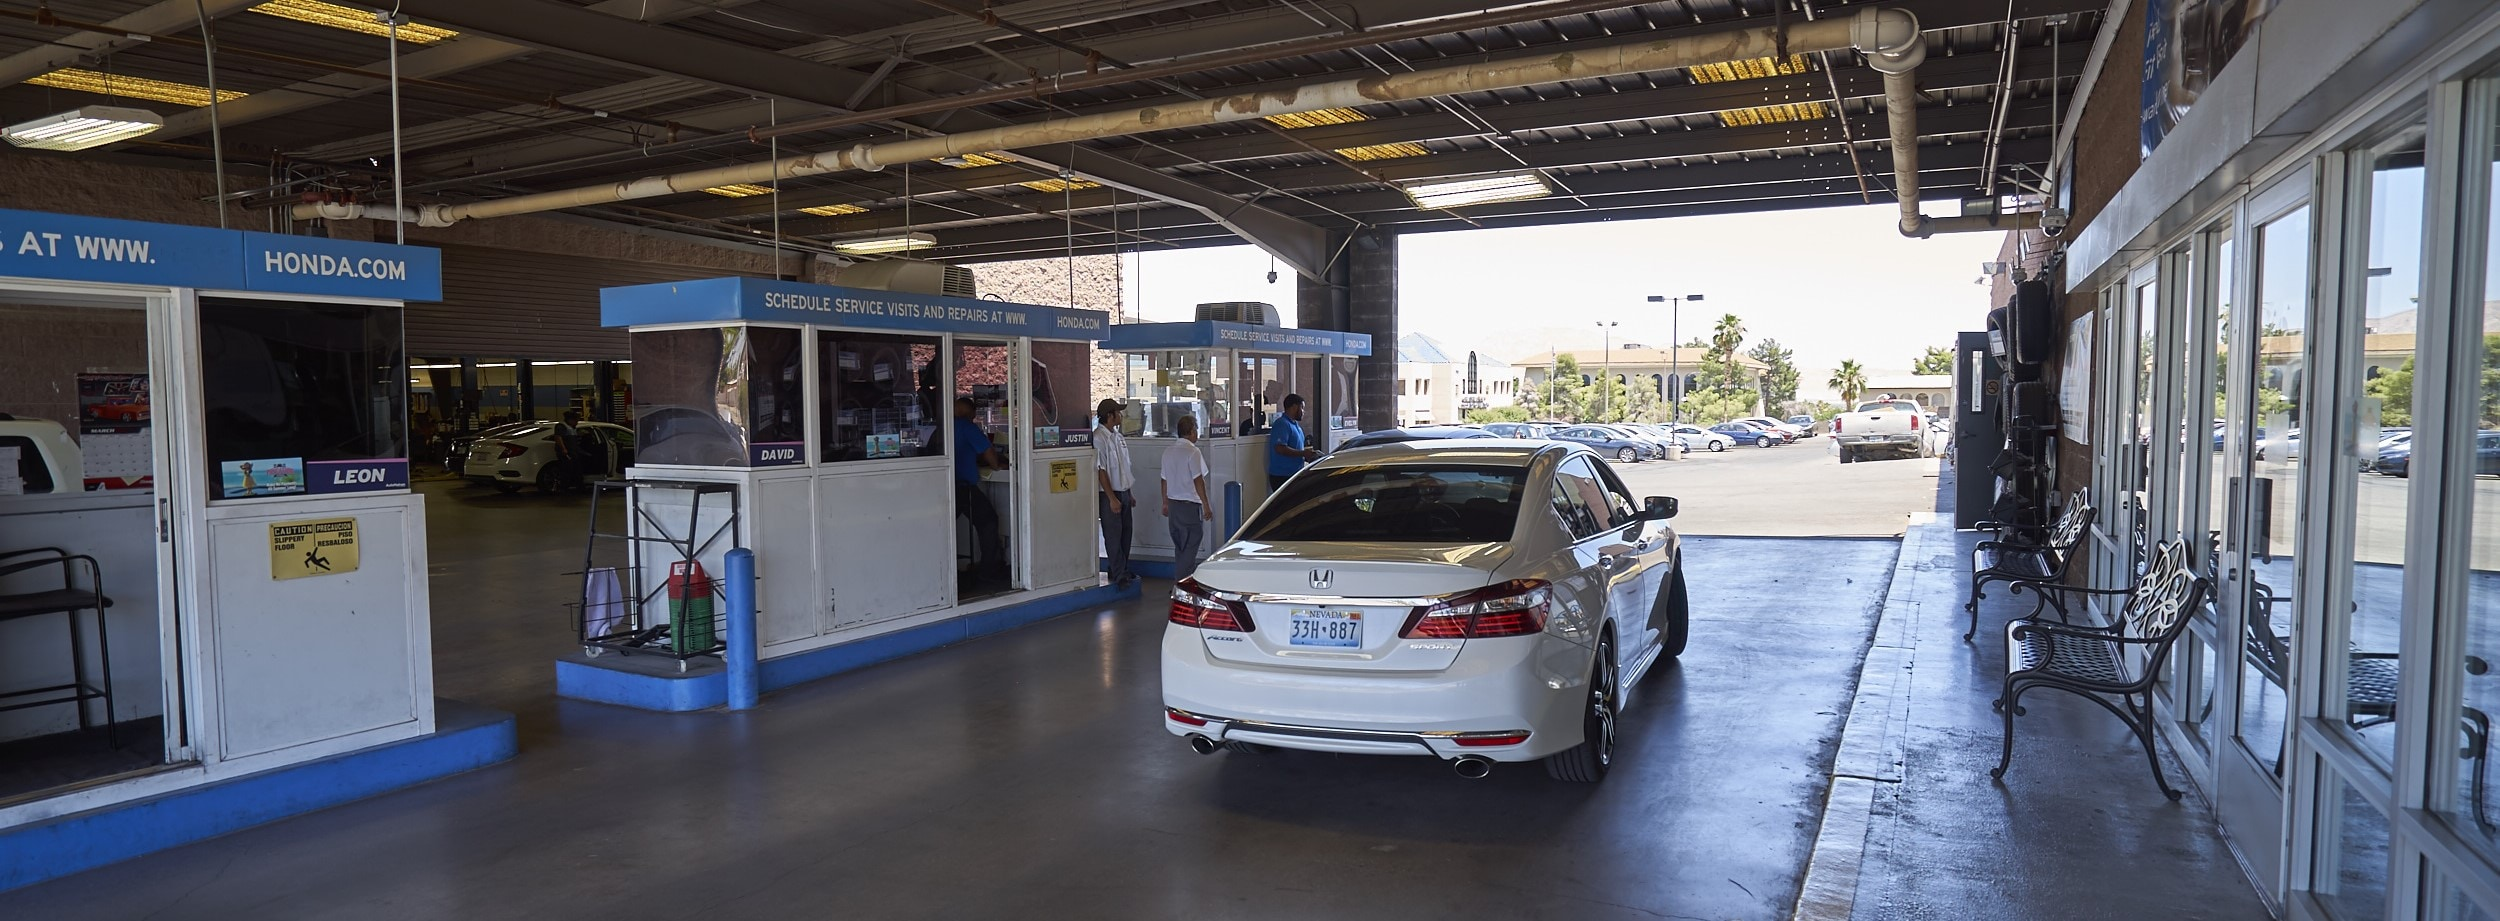 Honda Service Center Near Me Las Vegas Nv Autonation Honda East